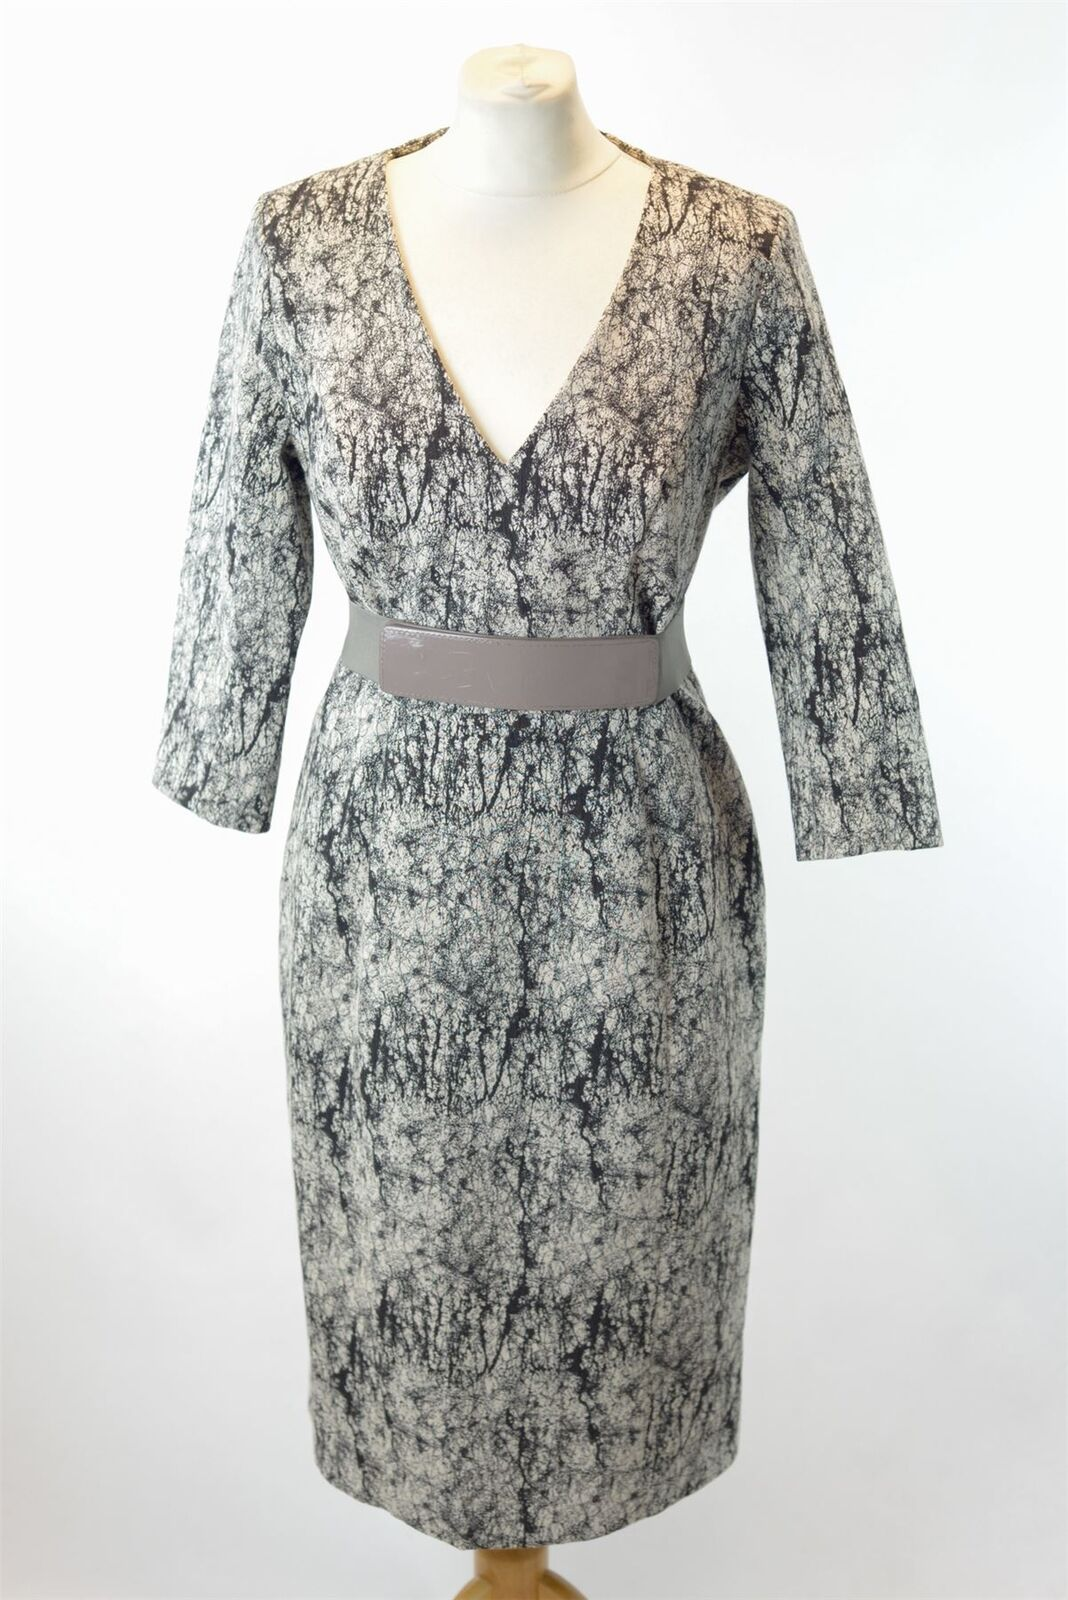 eeafbaa191cc3 CONNECTION Grey Print Dress Belt